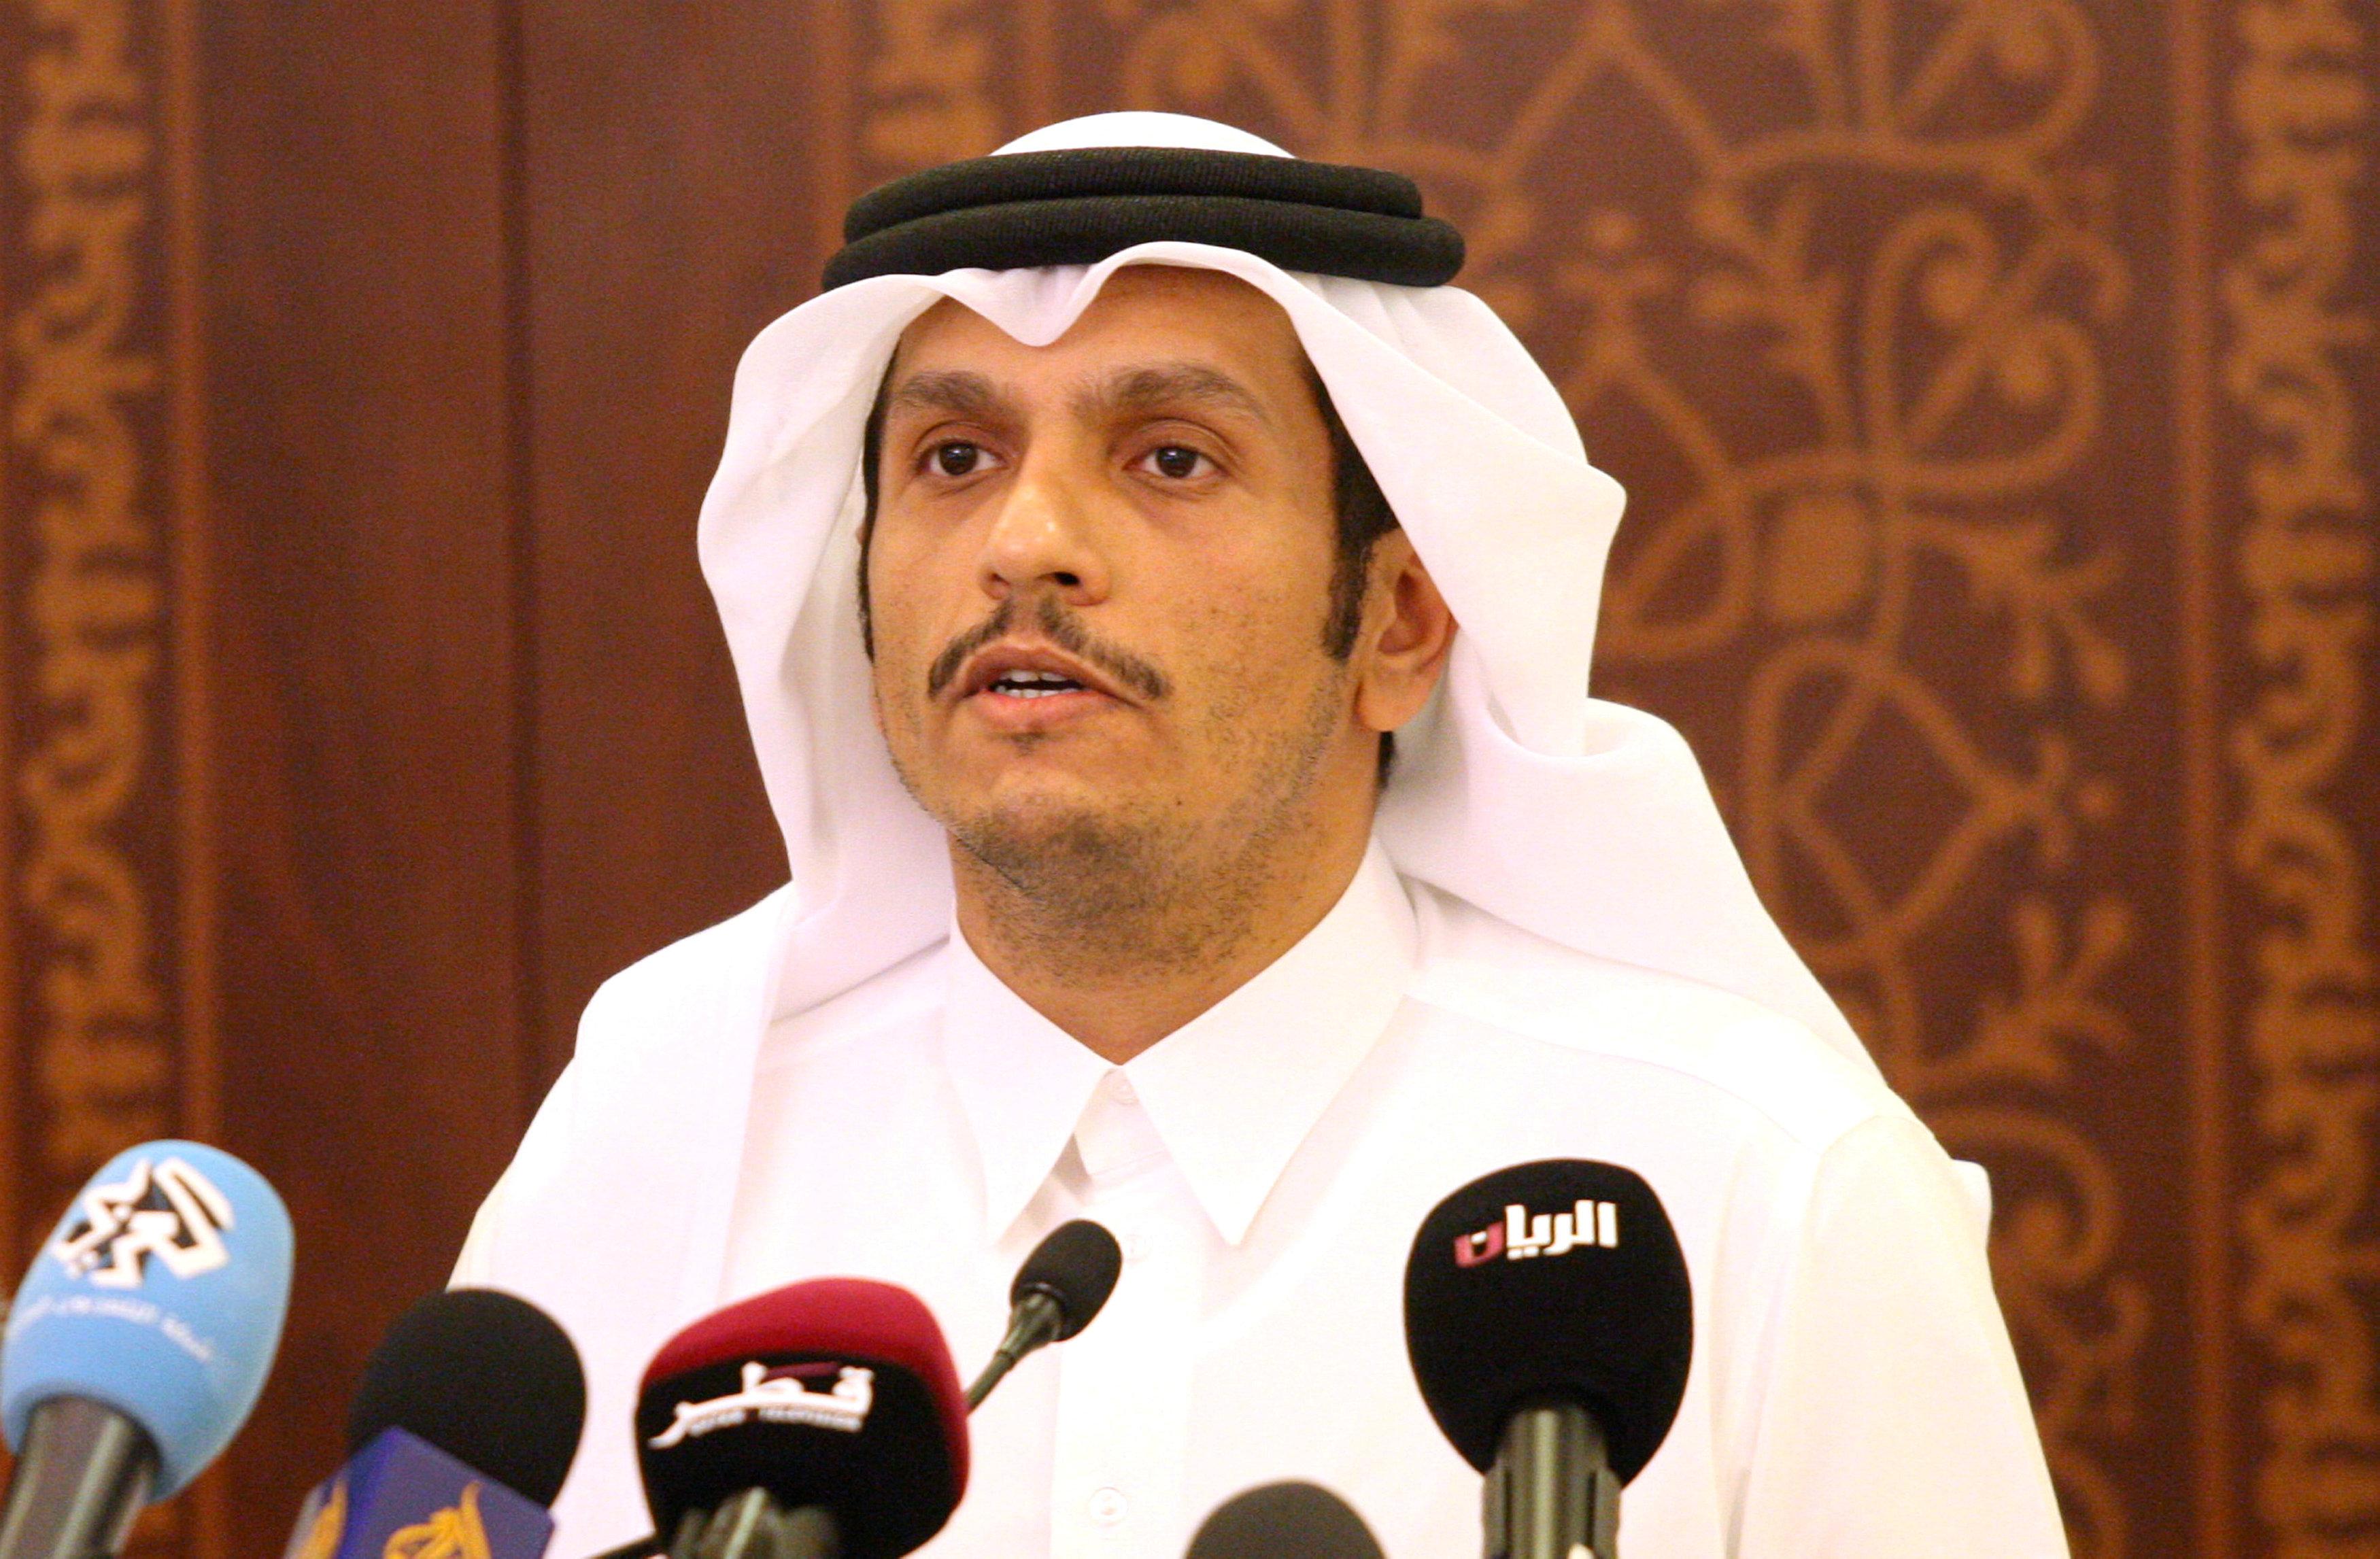 El canciller qatarí Mohammed bin Abdulrahman al-Thani (Reuters)